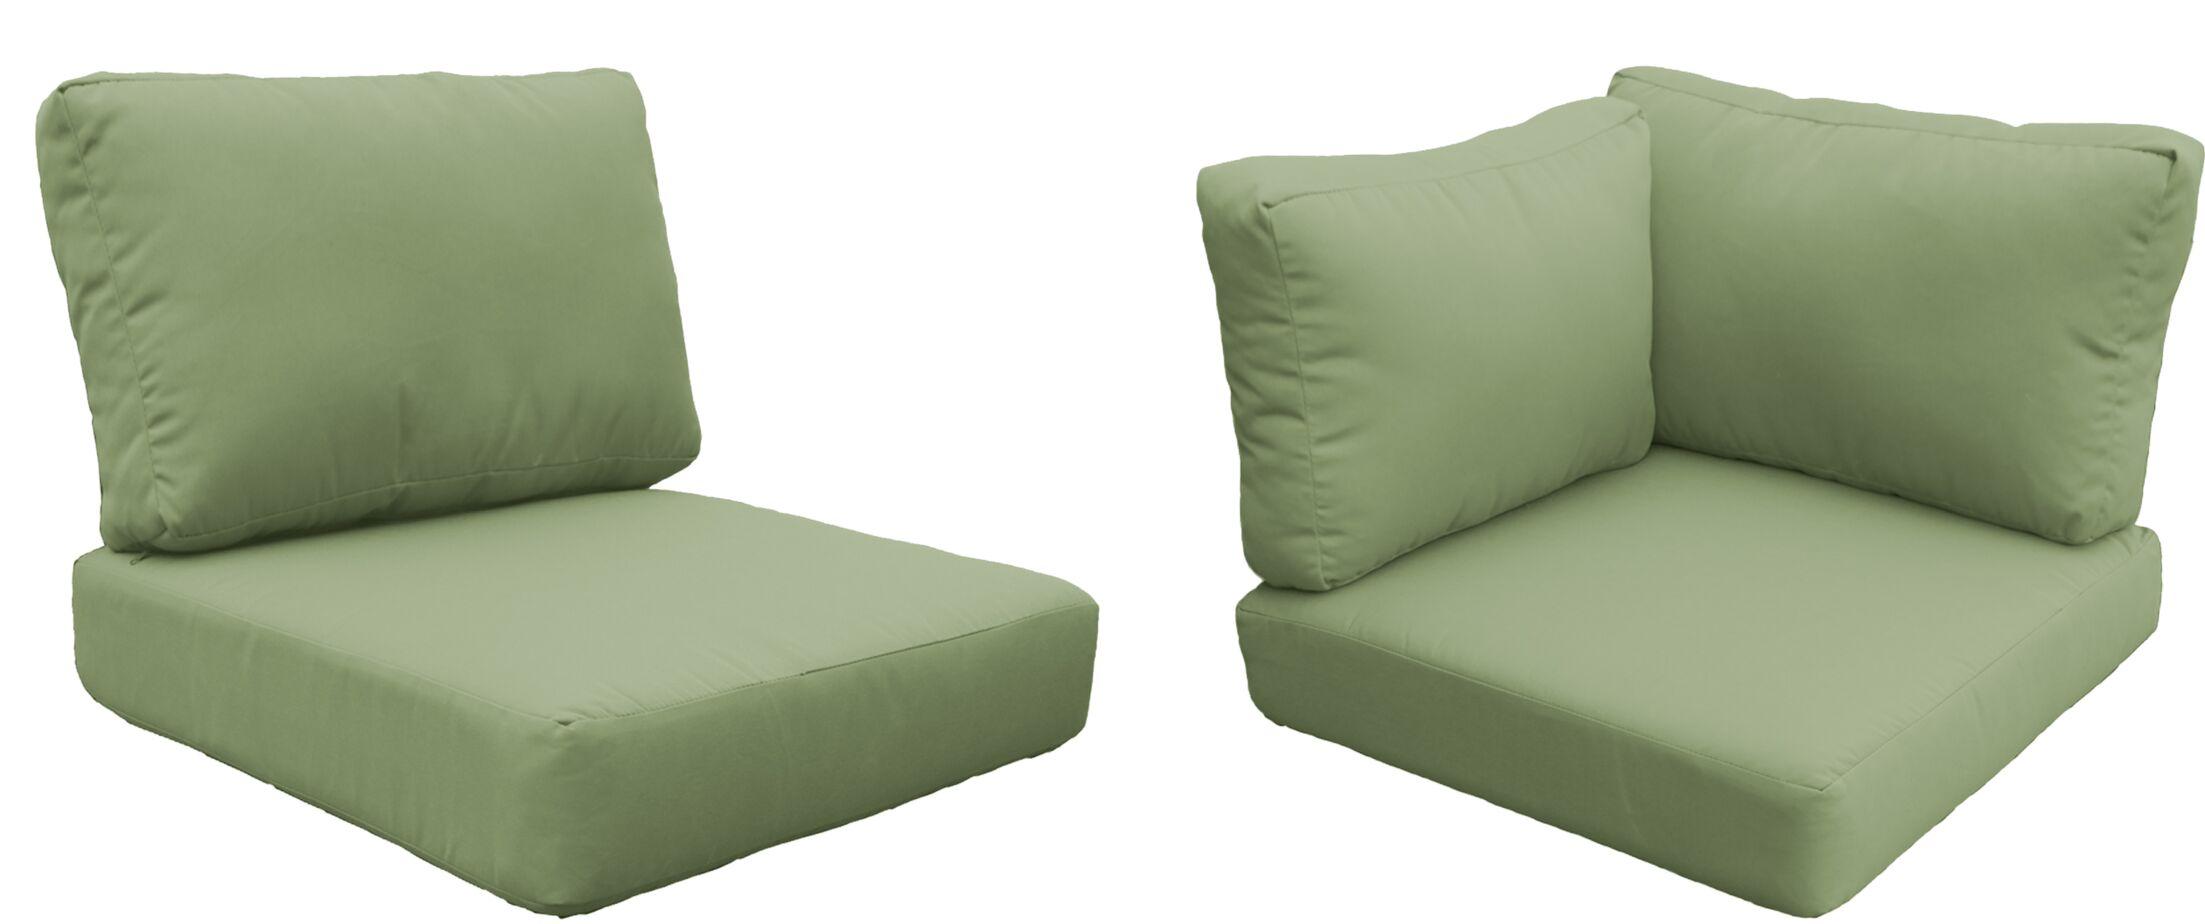 Coast OutdoorReplacement Cushion Set Fabric: Cilantro